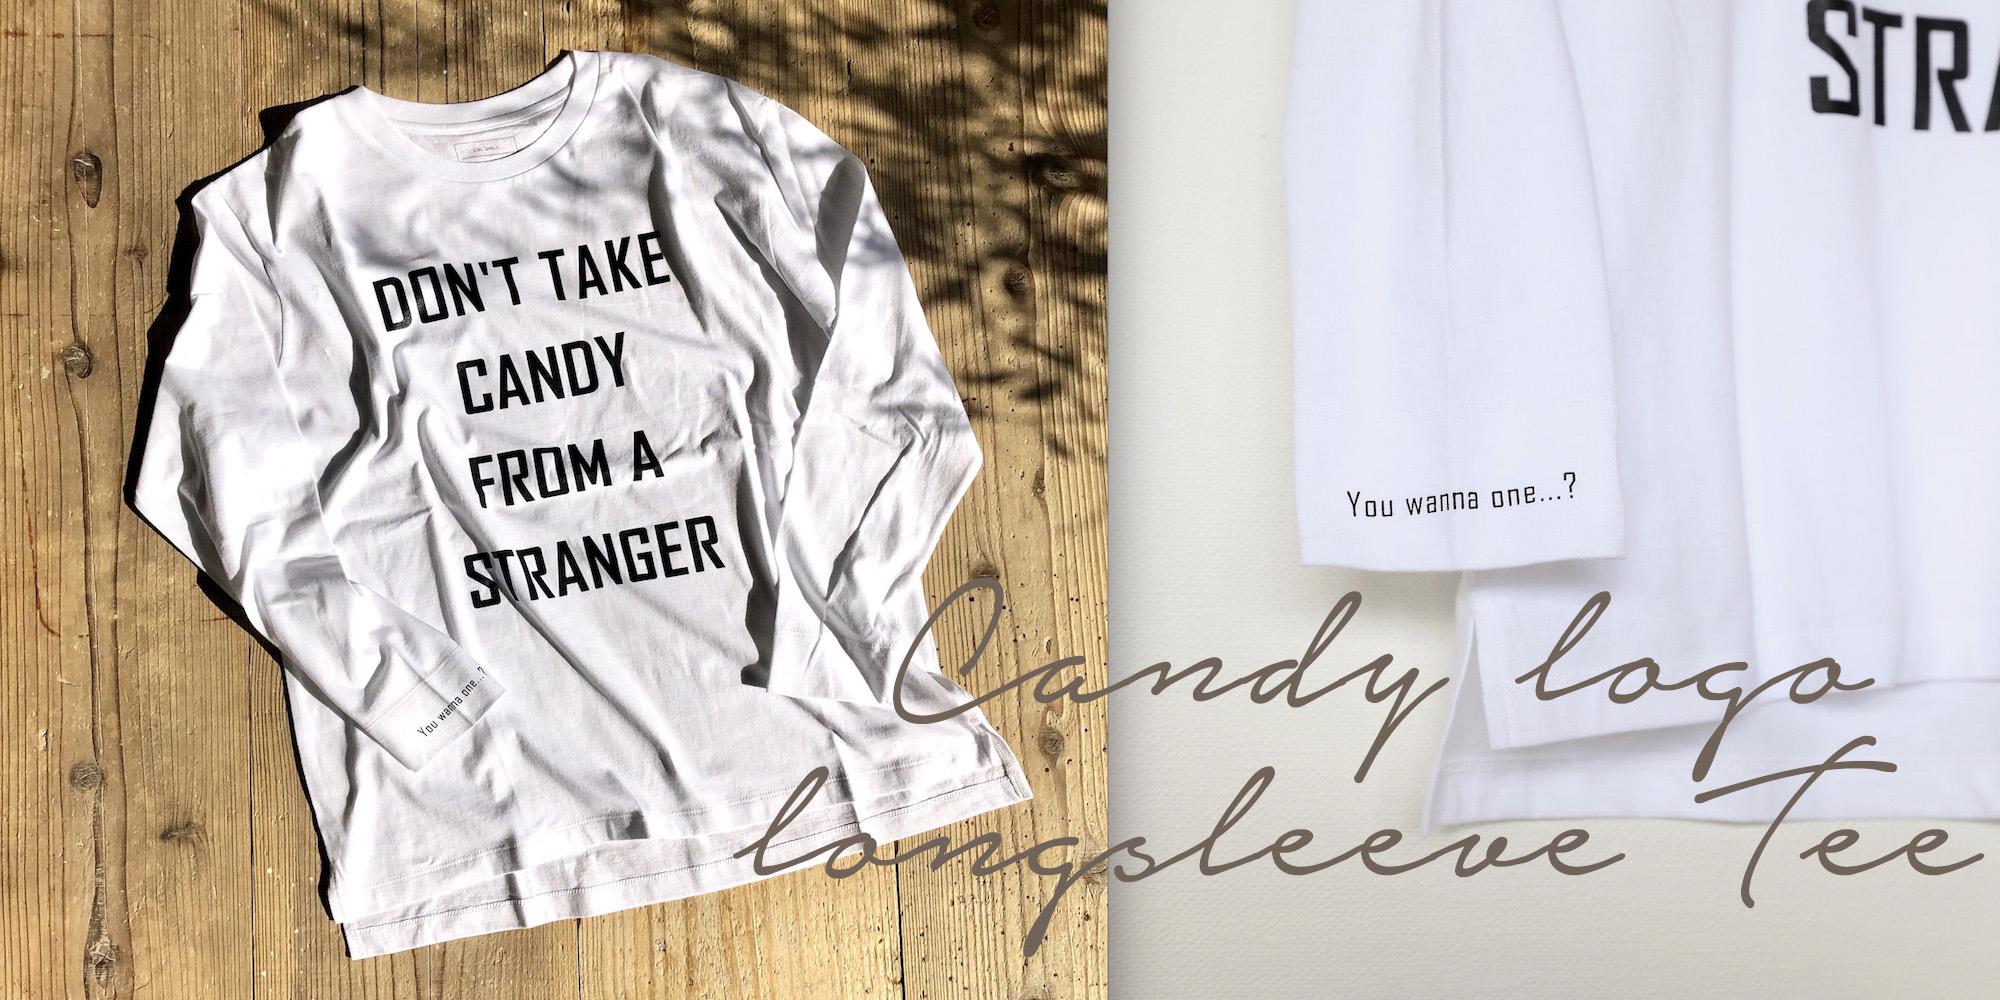 candyロンTイメージTOPのコピー